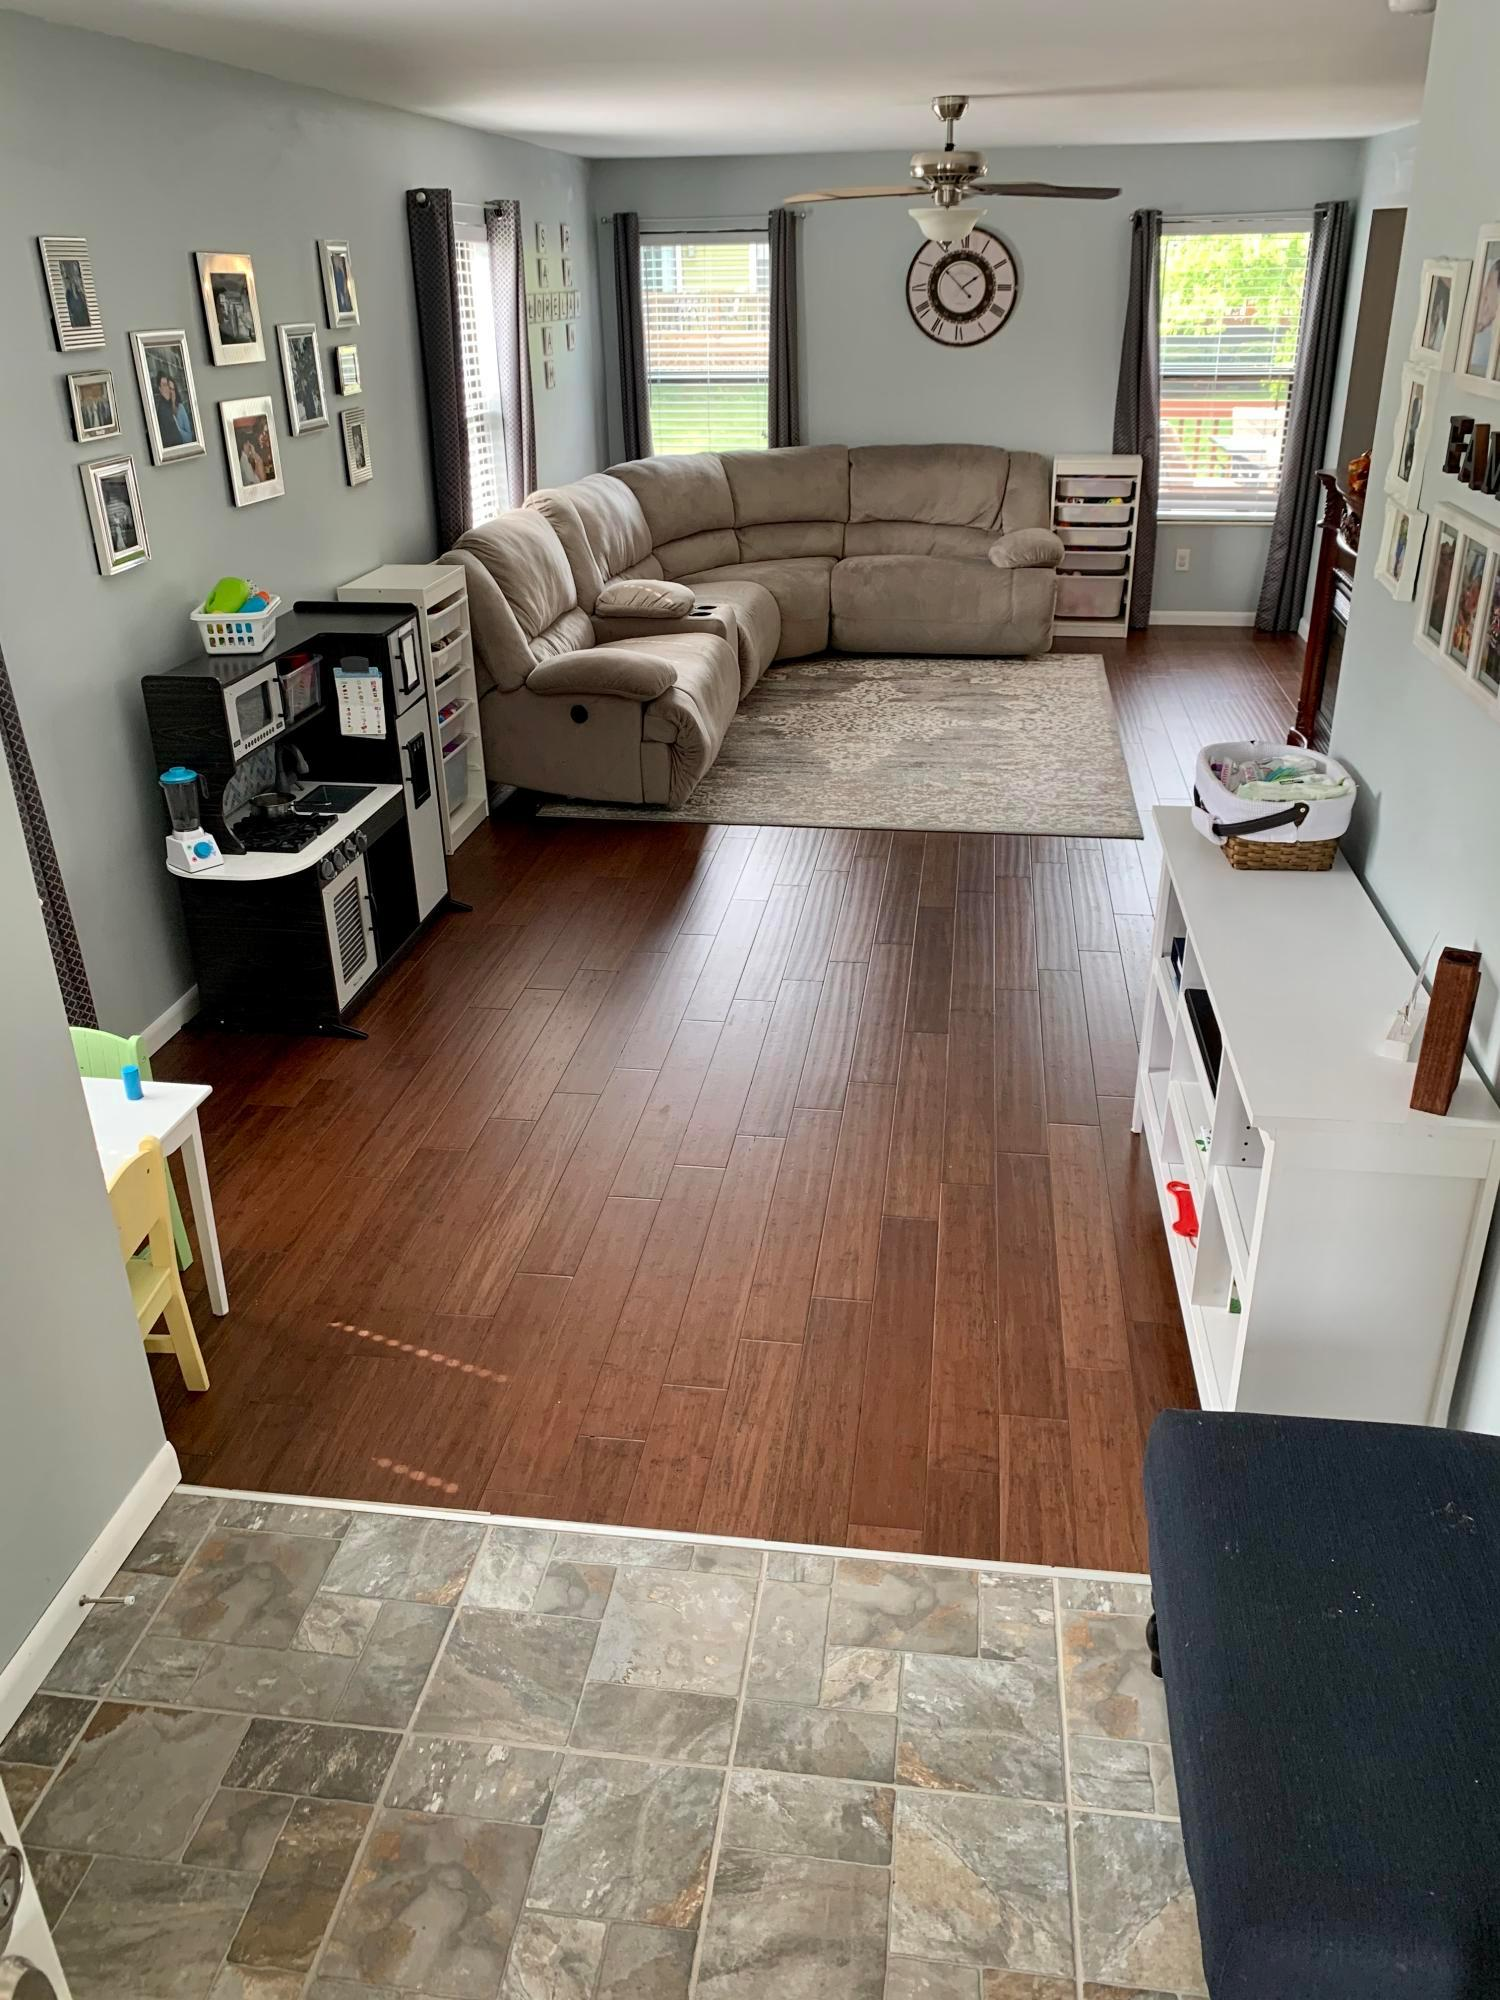 3668 Seattle Slew Drive, Columbus, Ohio 43221, 3 Bedrooms Bedrooms, ,3 BathroomsBathrooms,Residential,For Sale,Seattle Slew,220032116